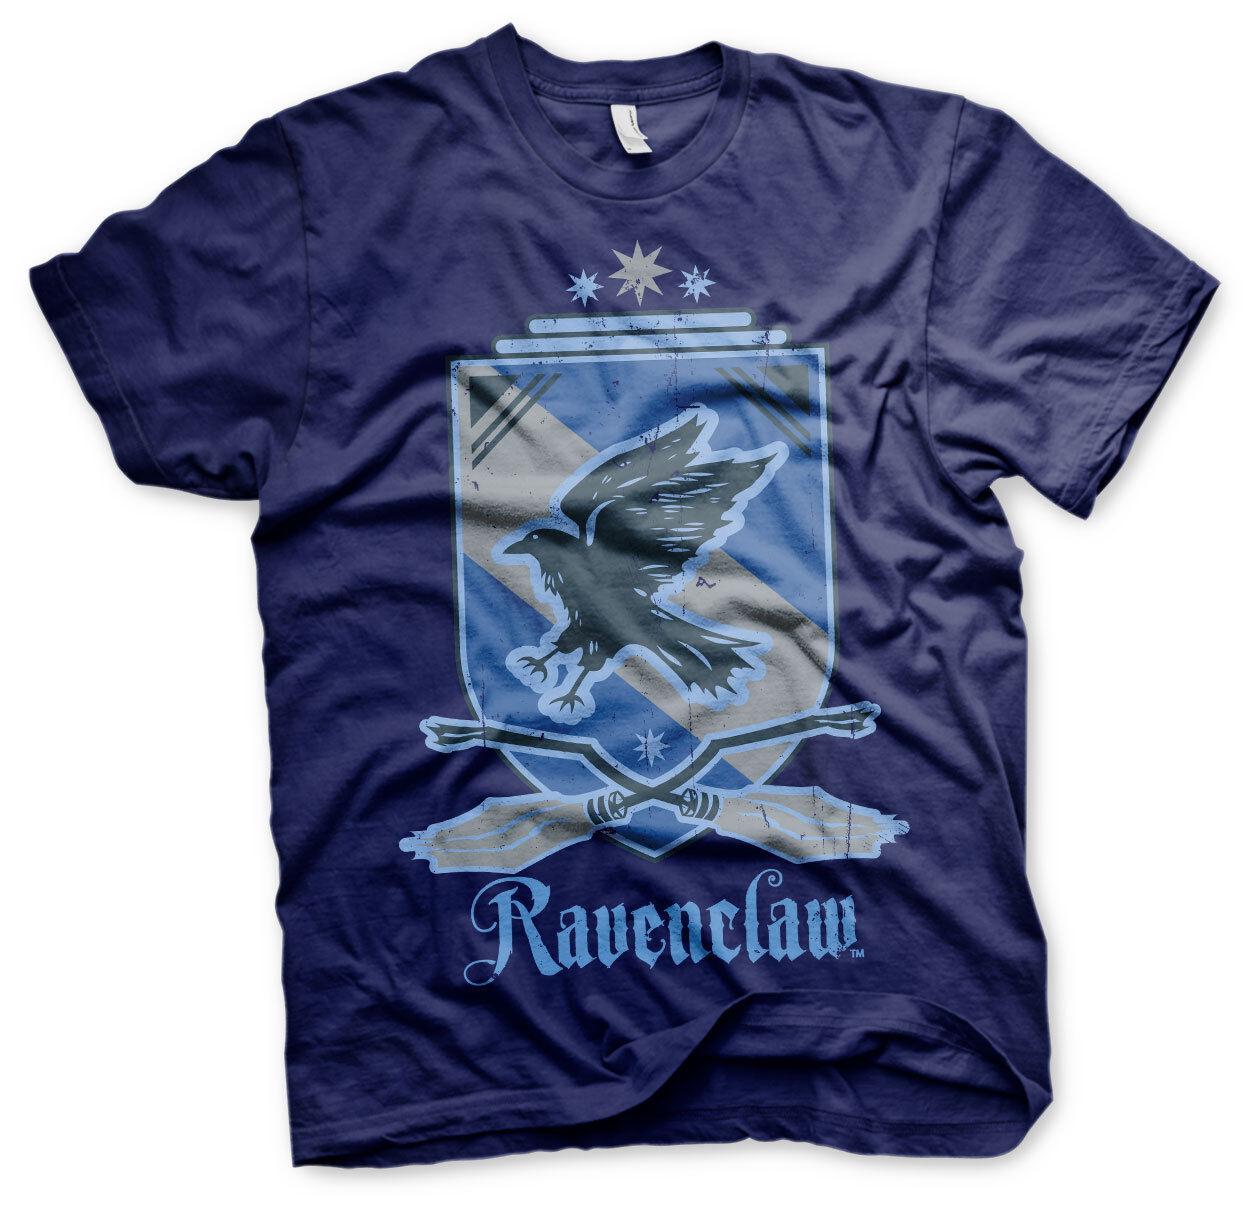 Harry Potter Ravenclaw Rabe Haus Wappen Crest Quidditch Team Männer Men T-Shirt